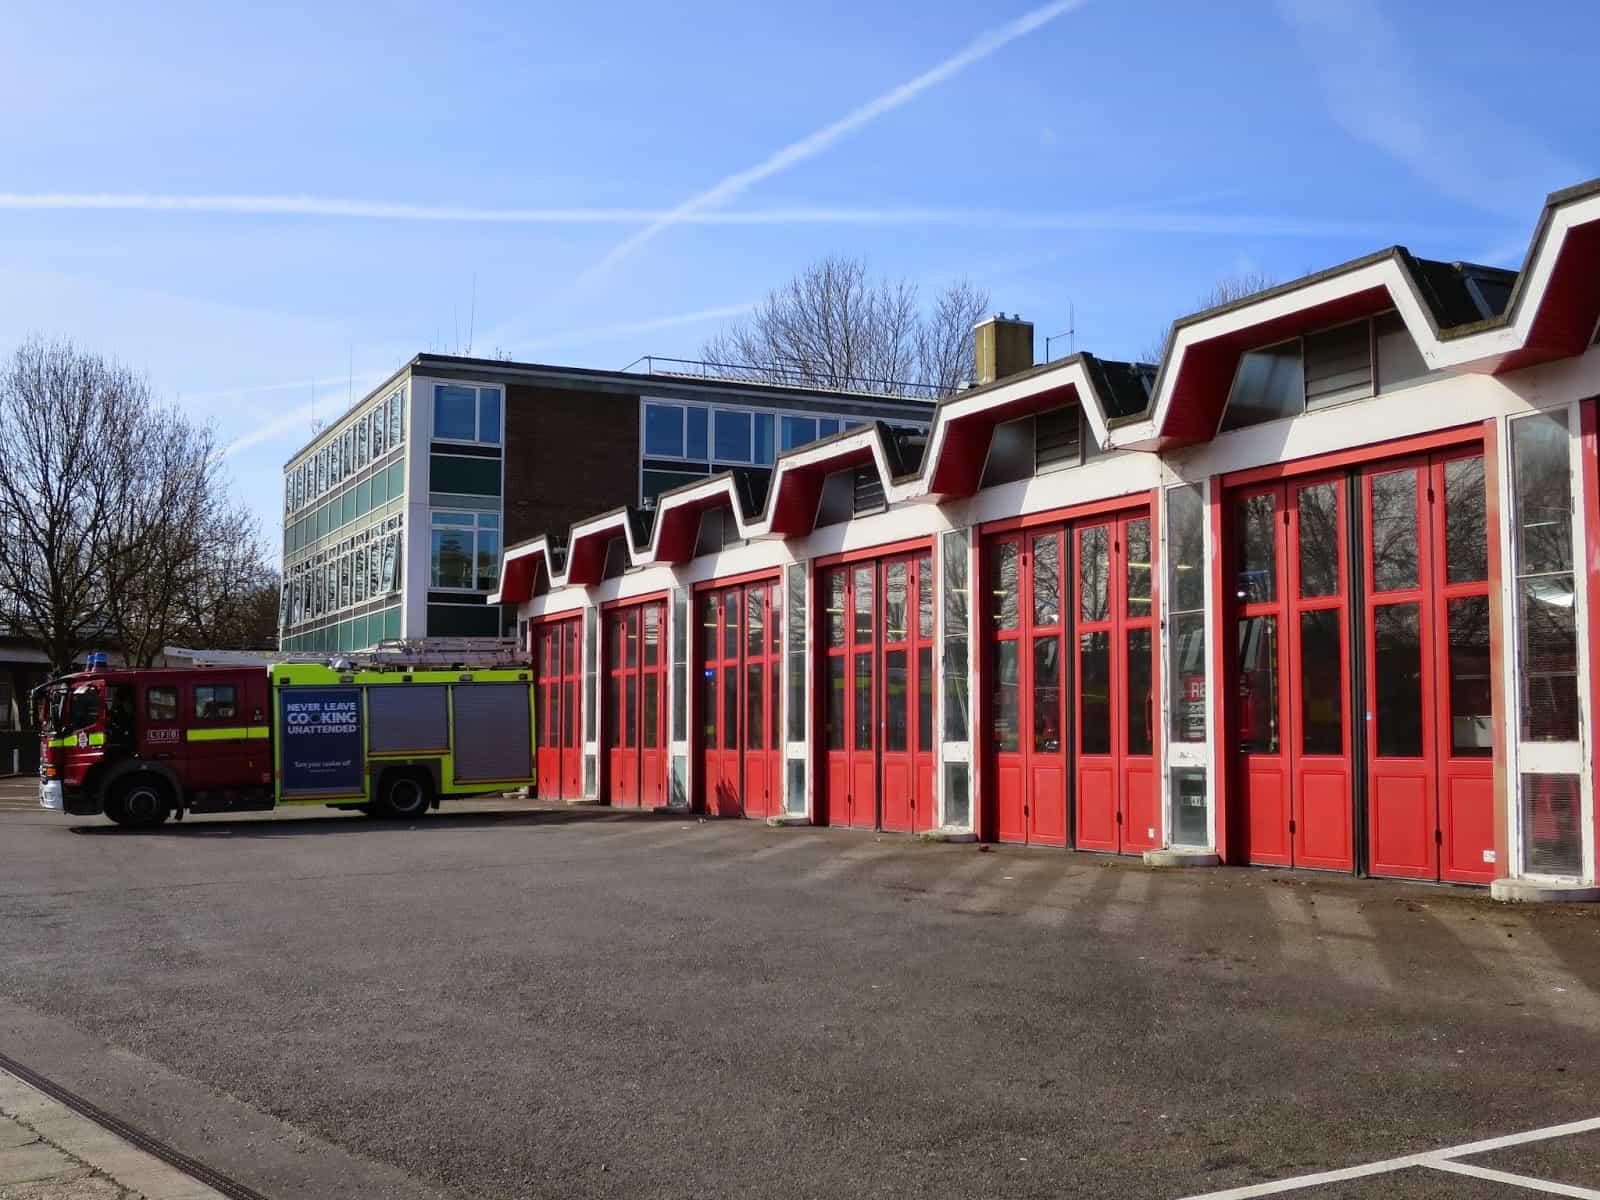 Croydon fire station - Croydon Fire Safety - expert fire safety services in croydon